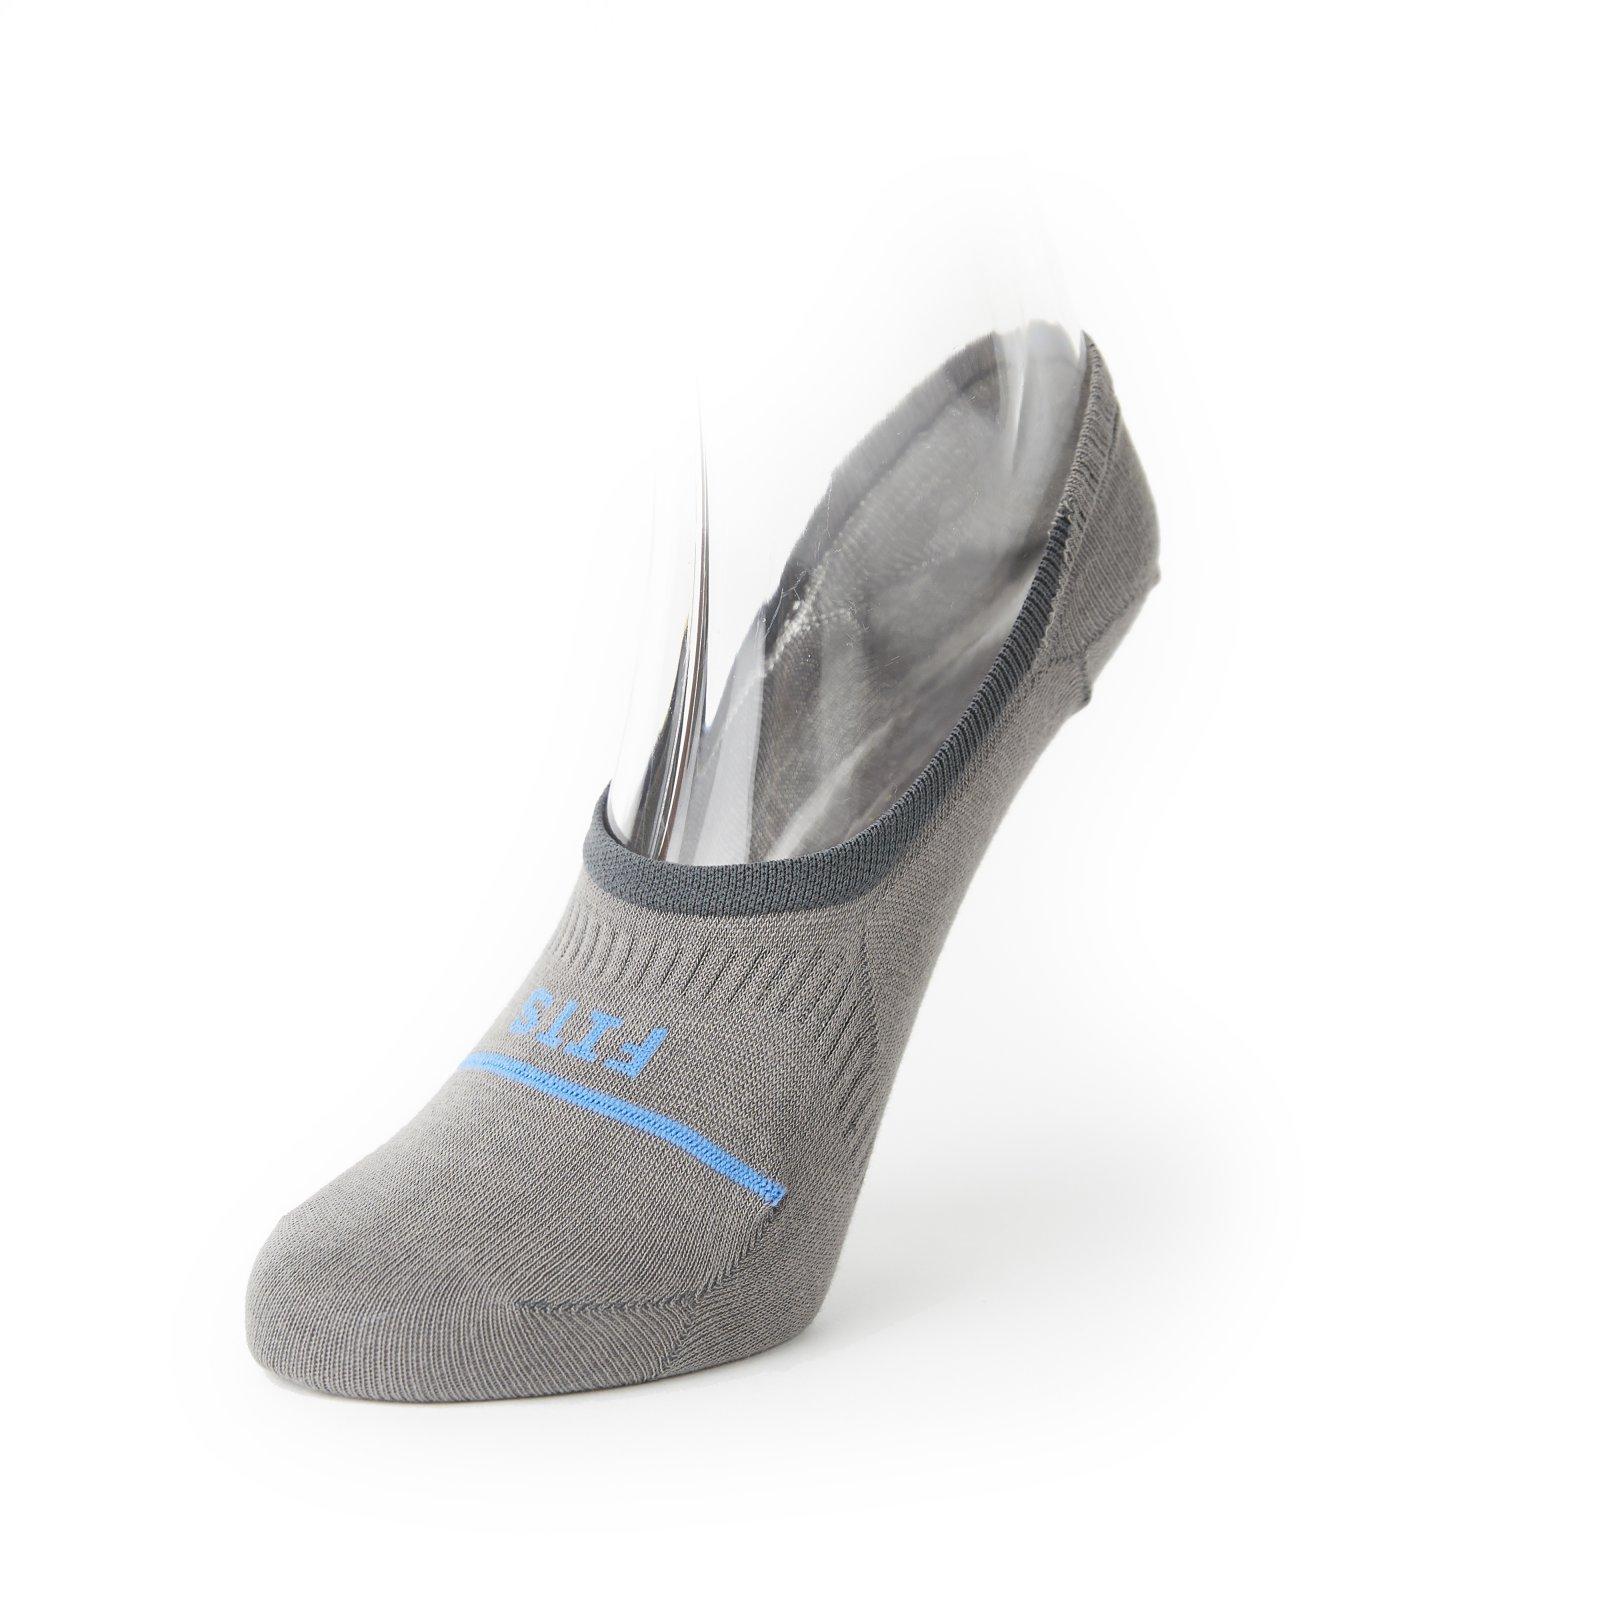 FITS Invisble Socks